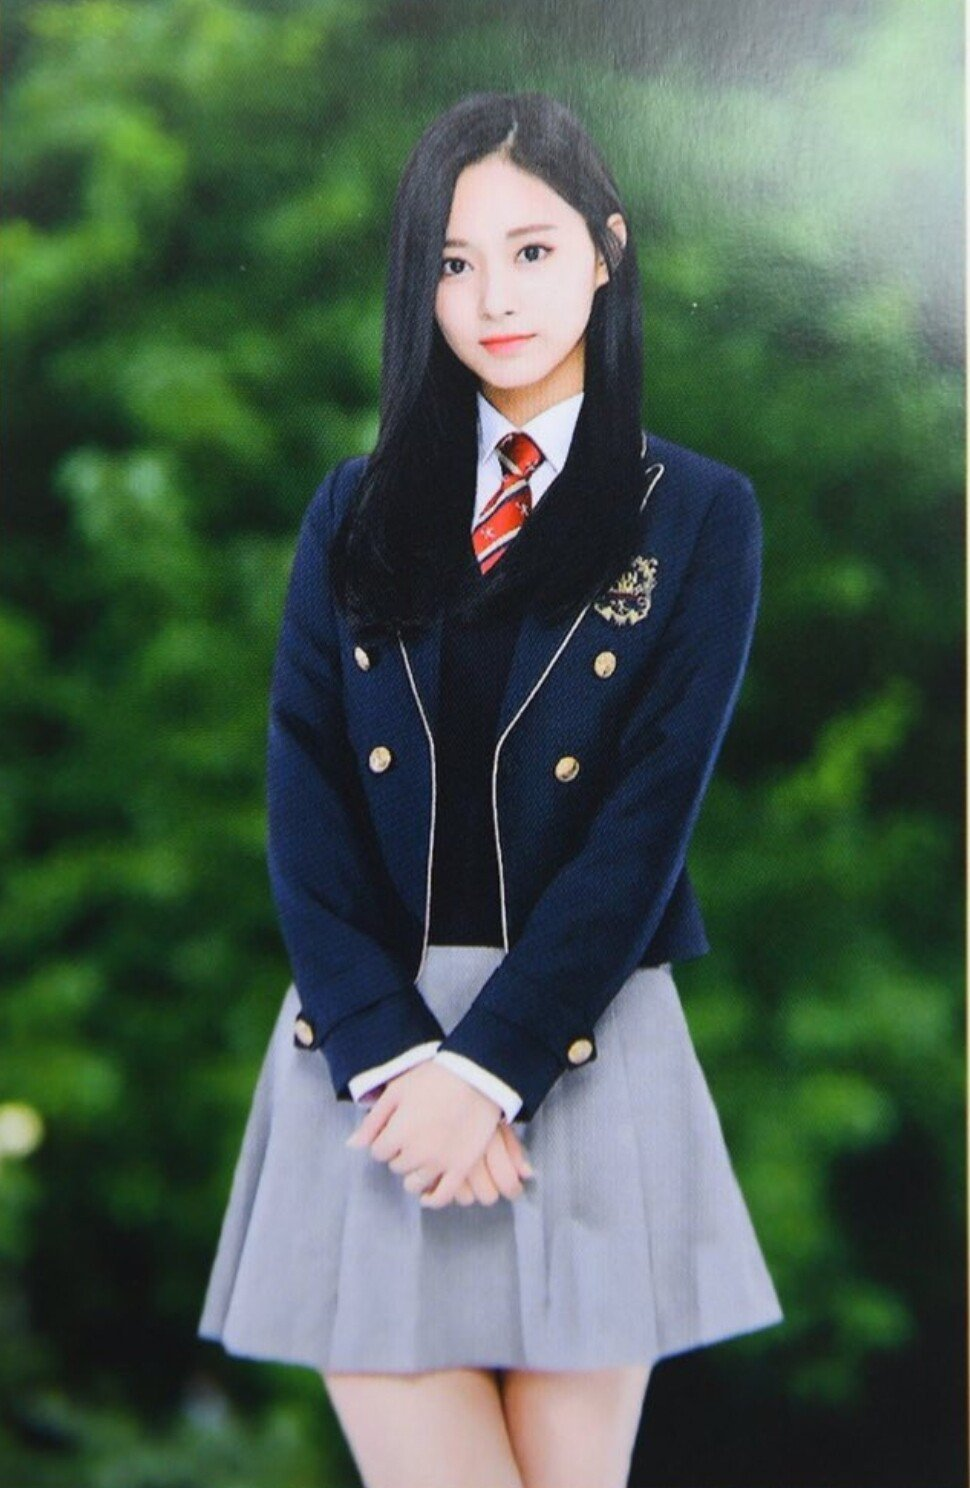 Screenshot_20190212-111533_에펨코리아.jpg 오늘 고등학교 졸업한 트와이스 채영&쯔위